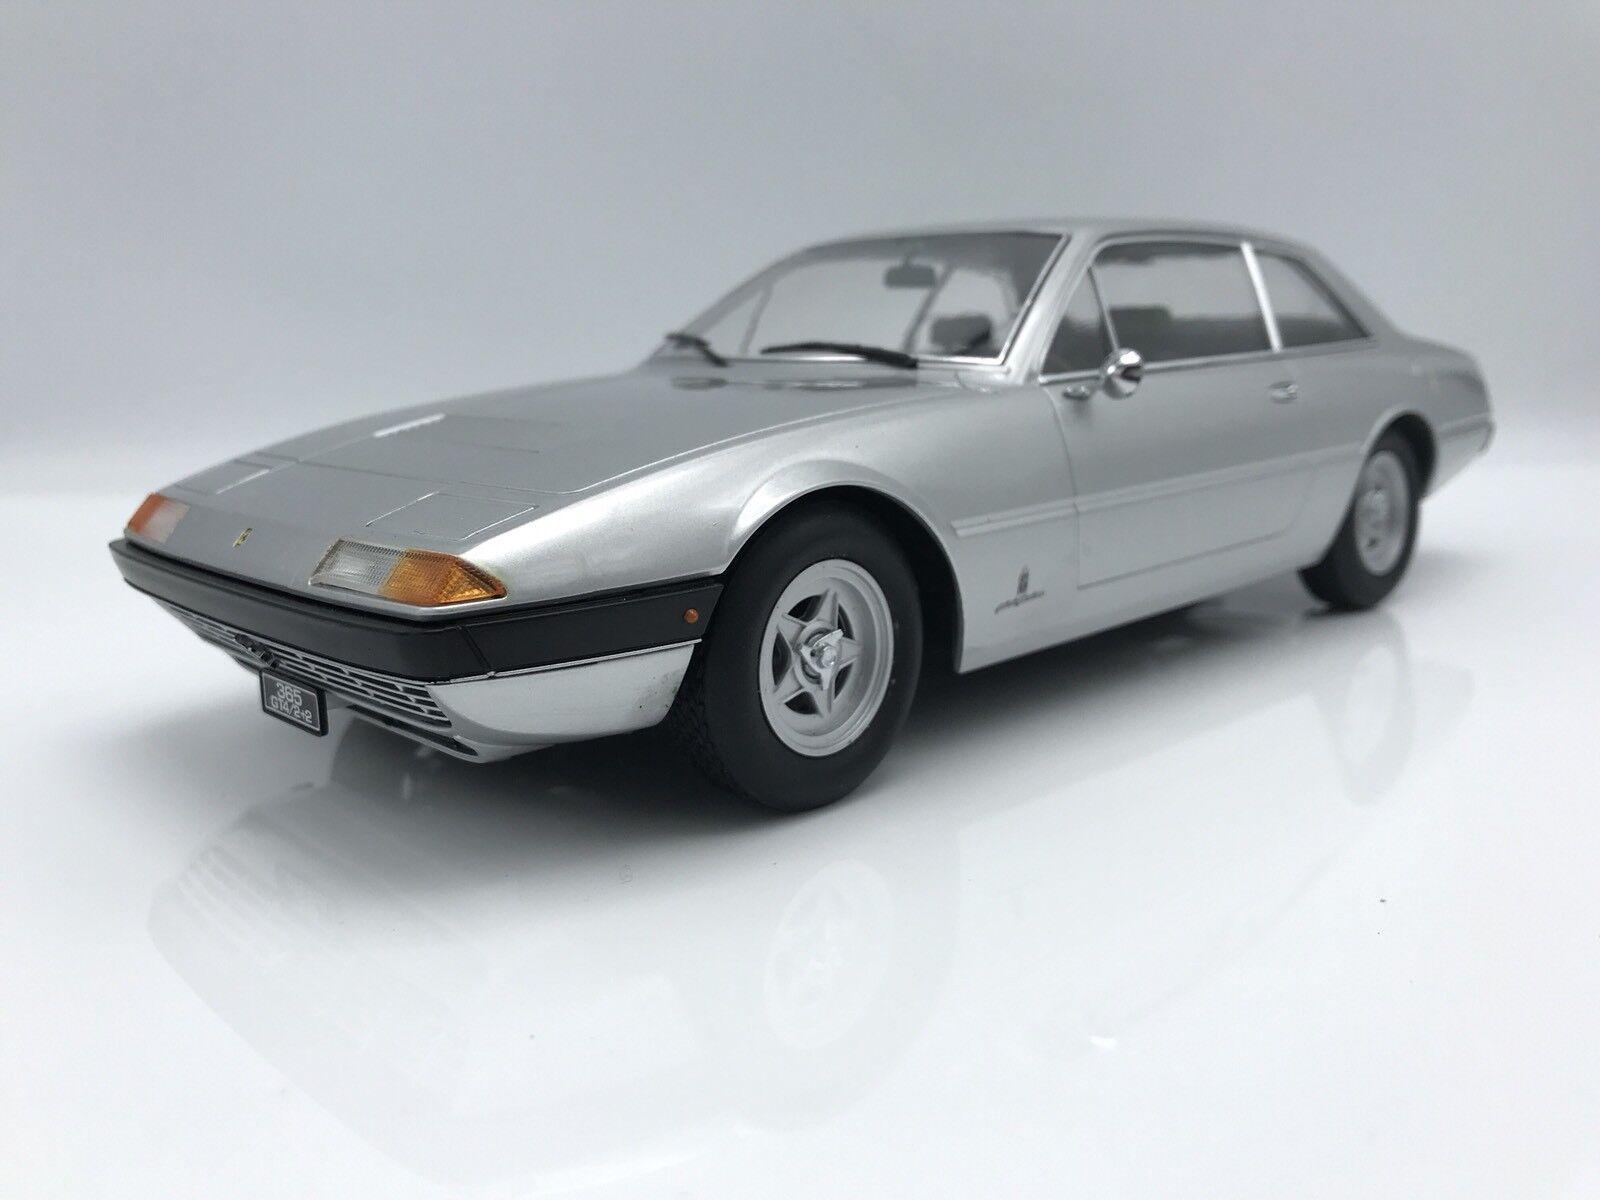 Ferrari 365 gt4 2+2 1972 Argent - 1 18 KK-Scale    NEW